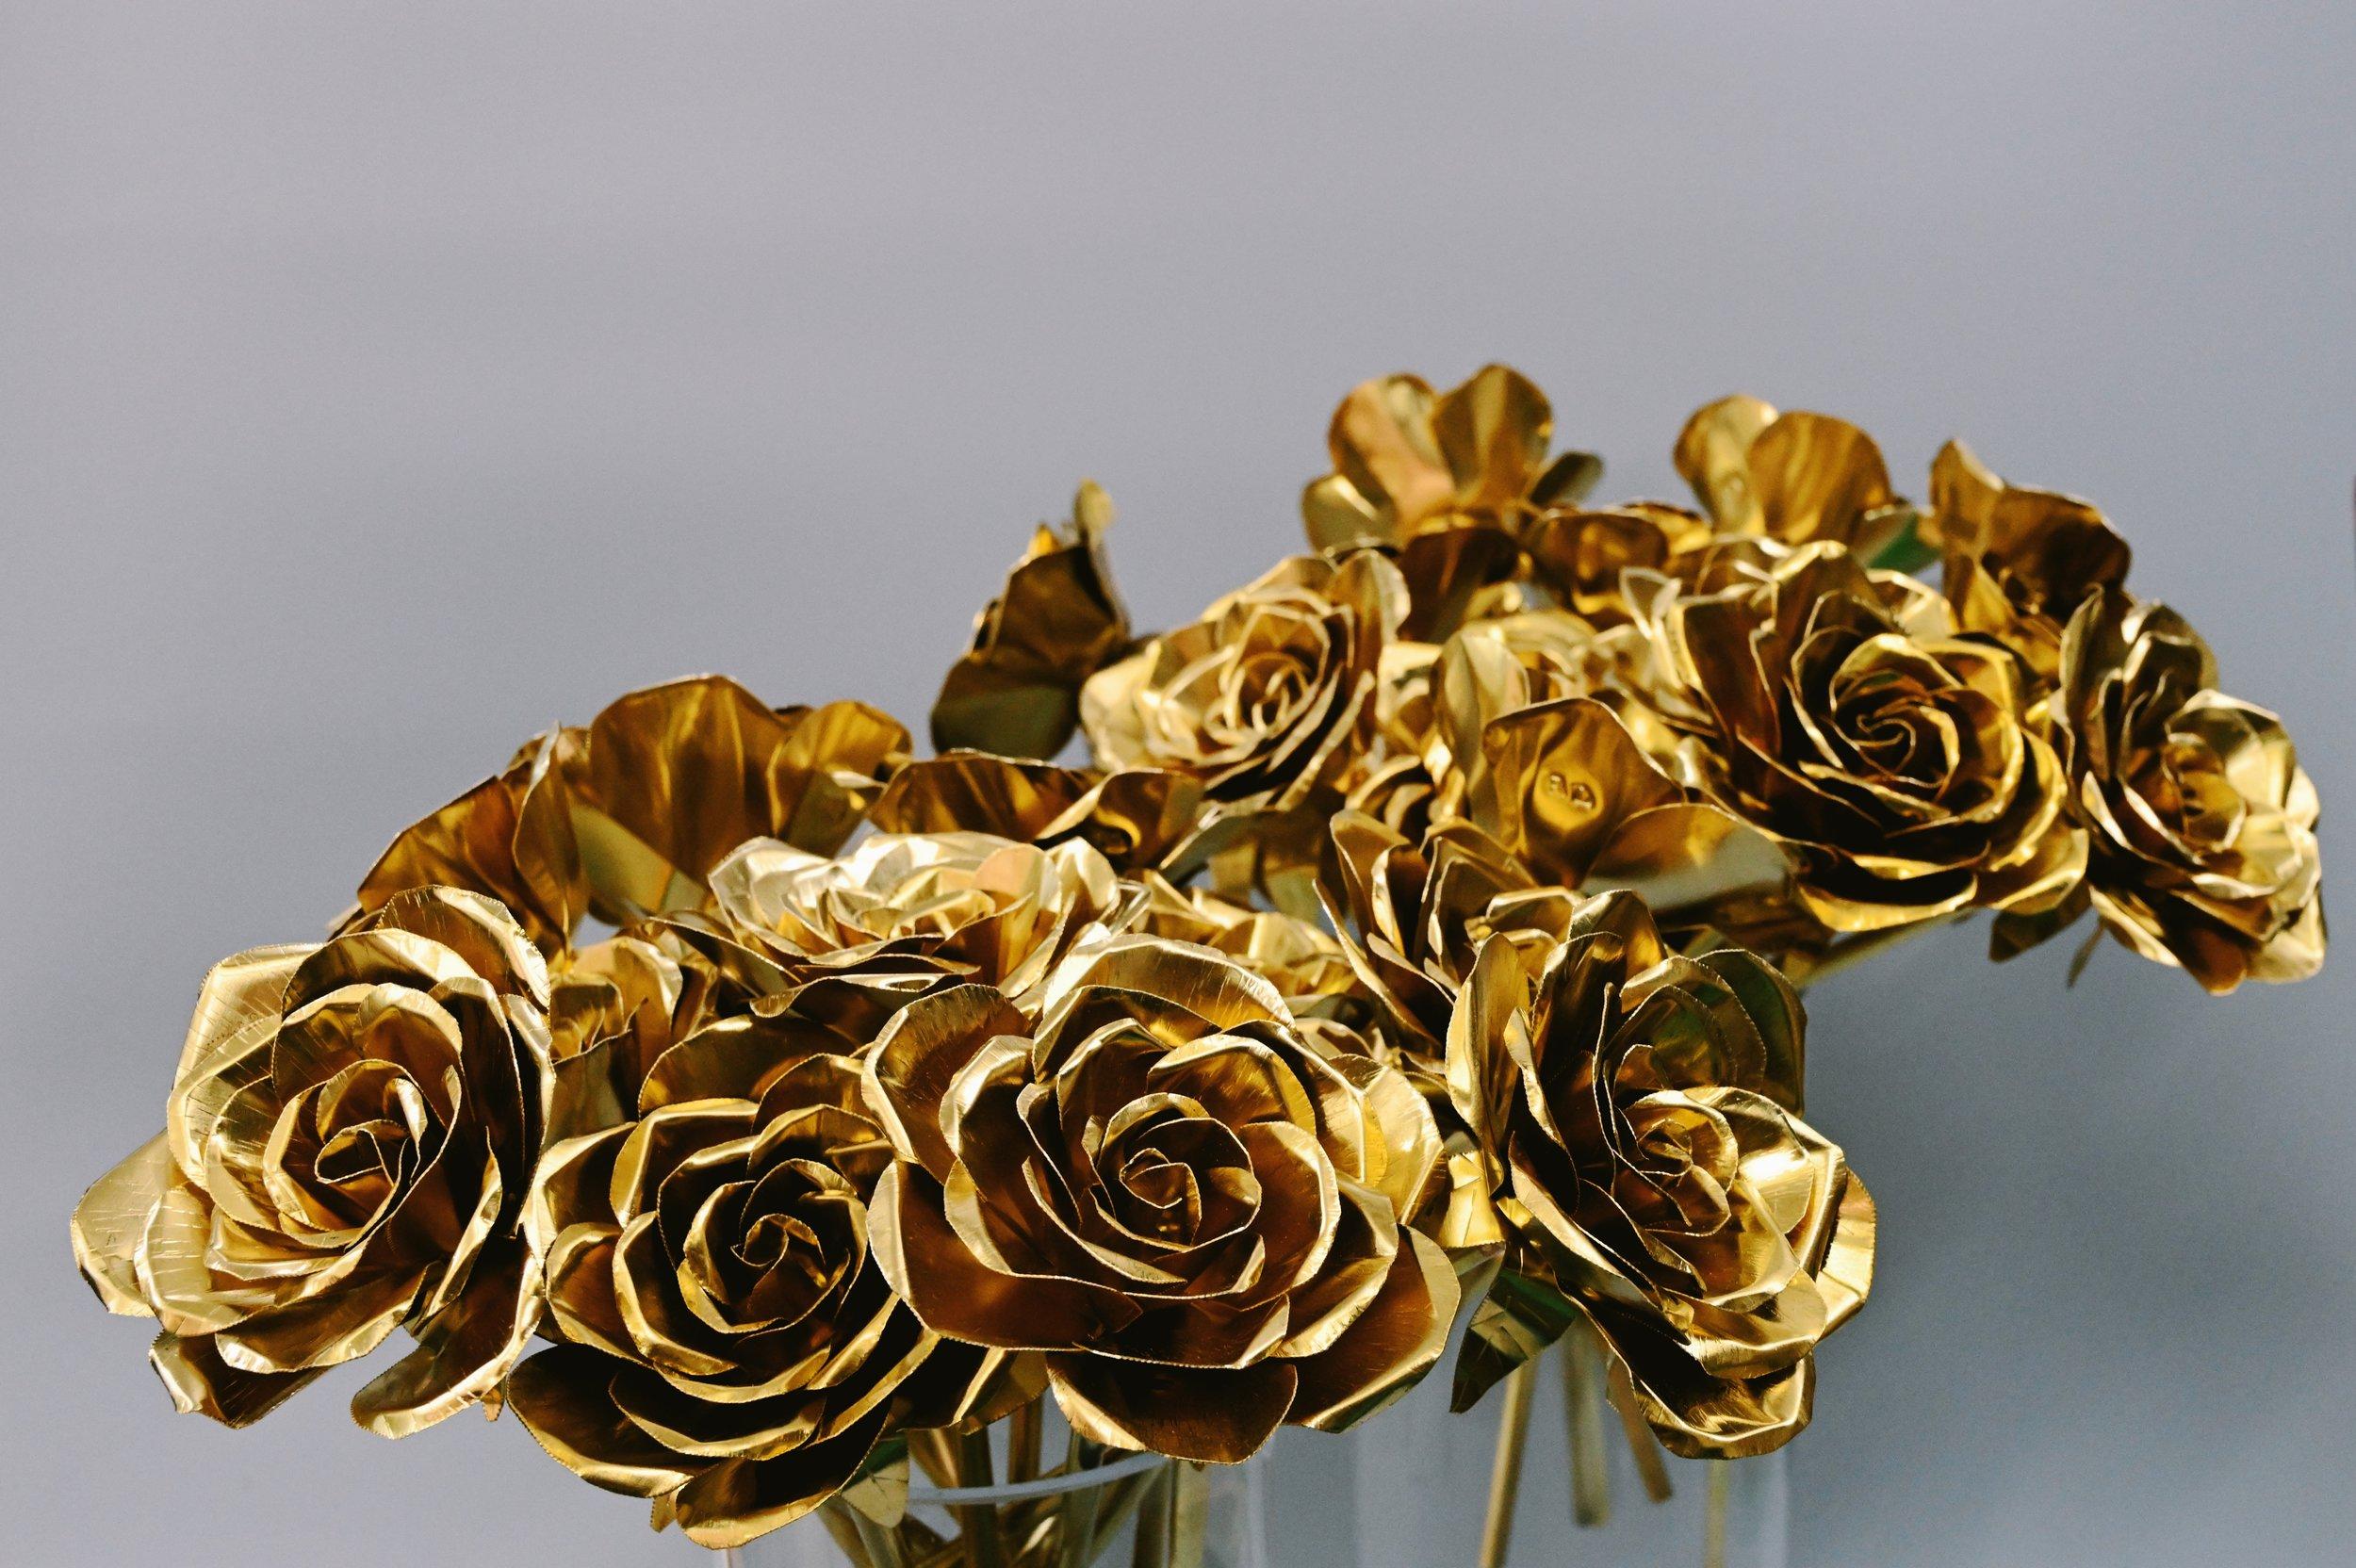 3hrs 銅玫瑰製作班Copper Rose Making - 適合新手/自稱手殘者透過這簡短課程,參加者可嘗試如何以傳統打金手法將堅硬的金屬變成形態優雅的玫瑰,當中也可初嘗焊接的樂趣(非用膠水)~顏色選擇: 金 / 玫瑰金 /銀成品即日拎走